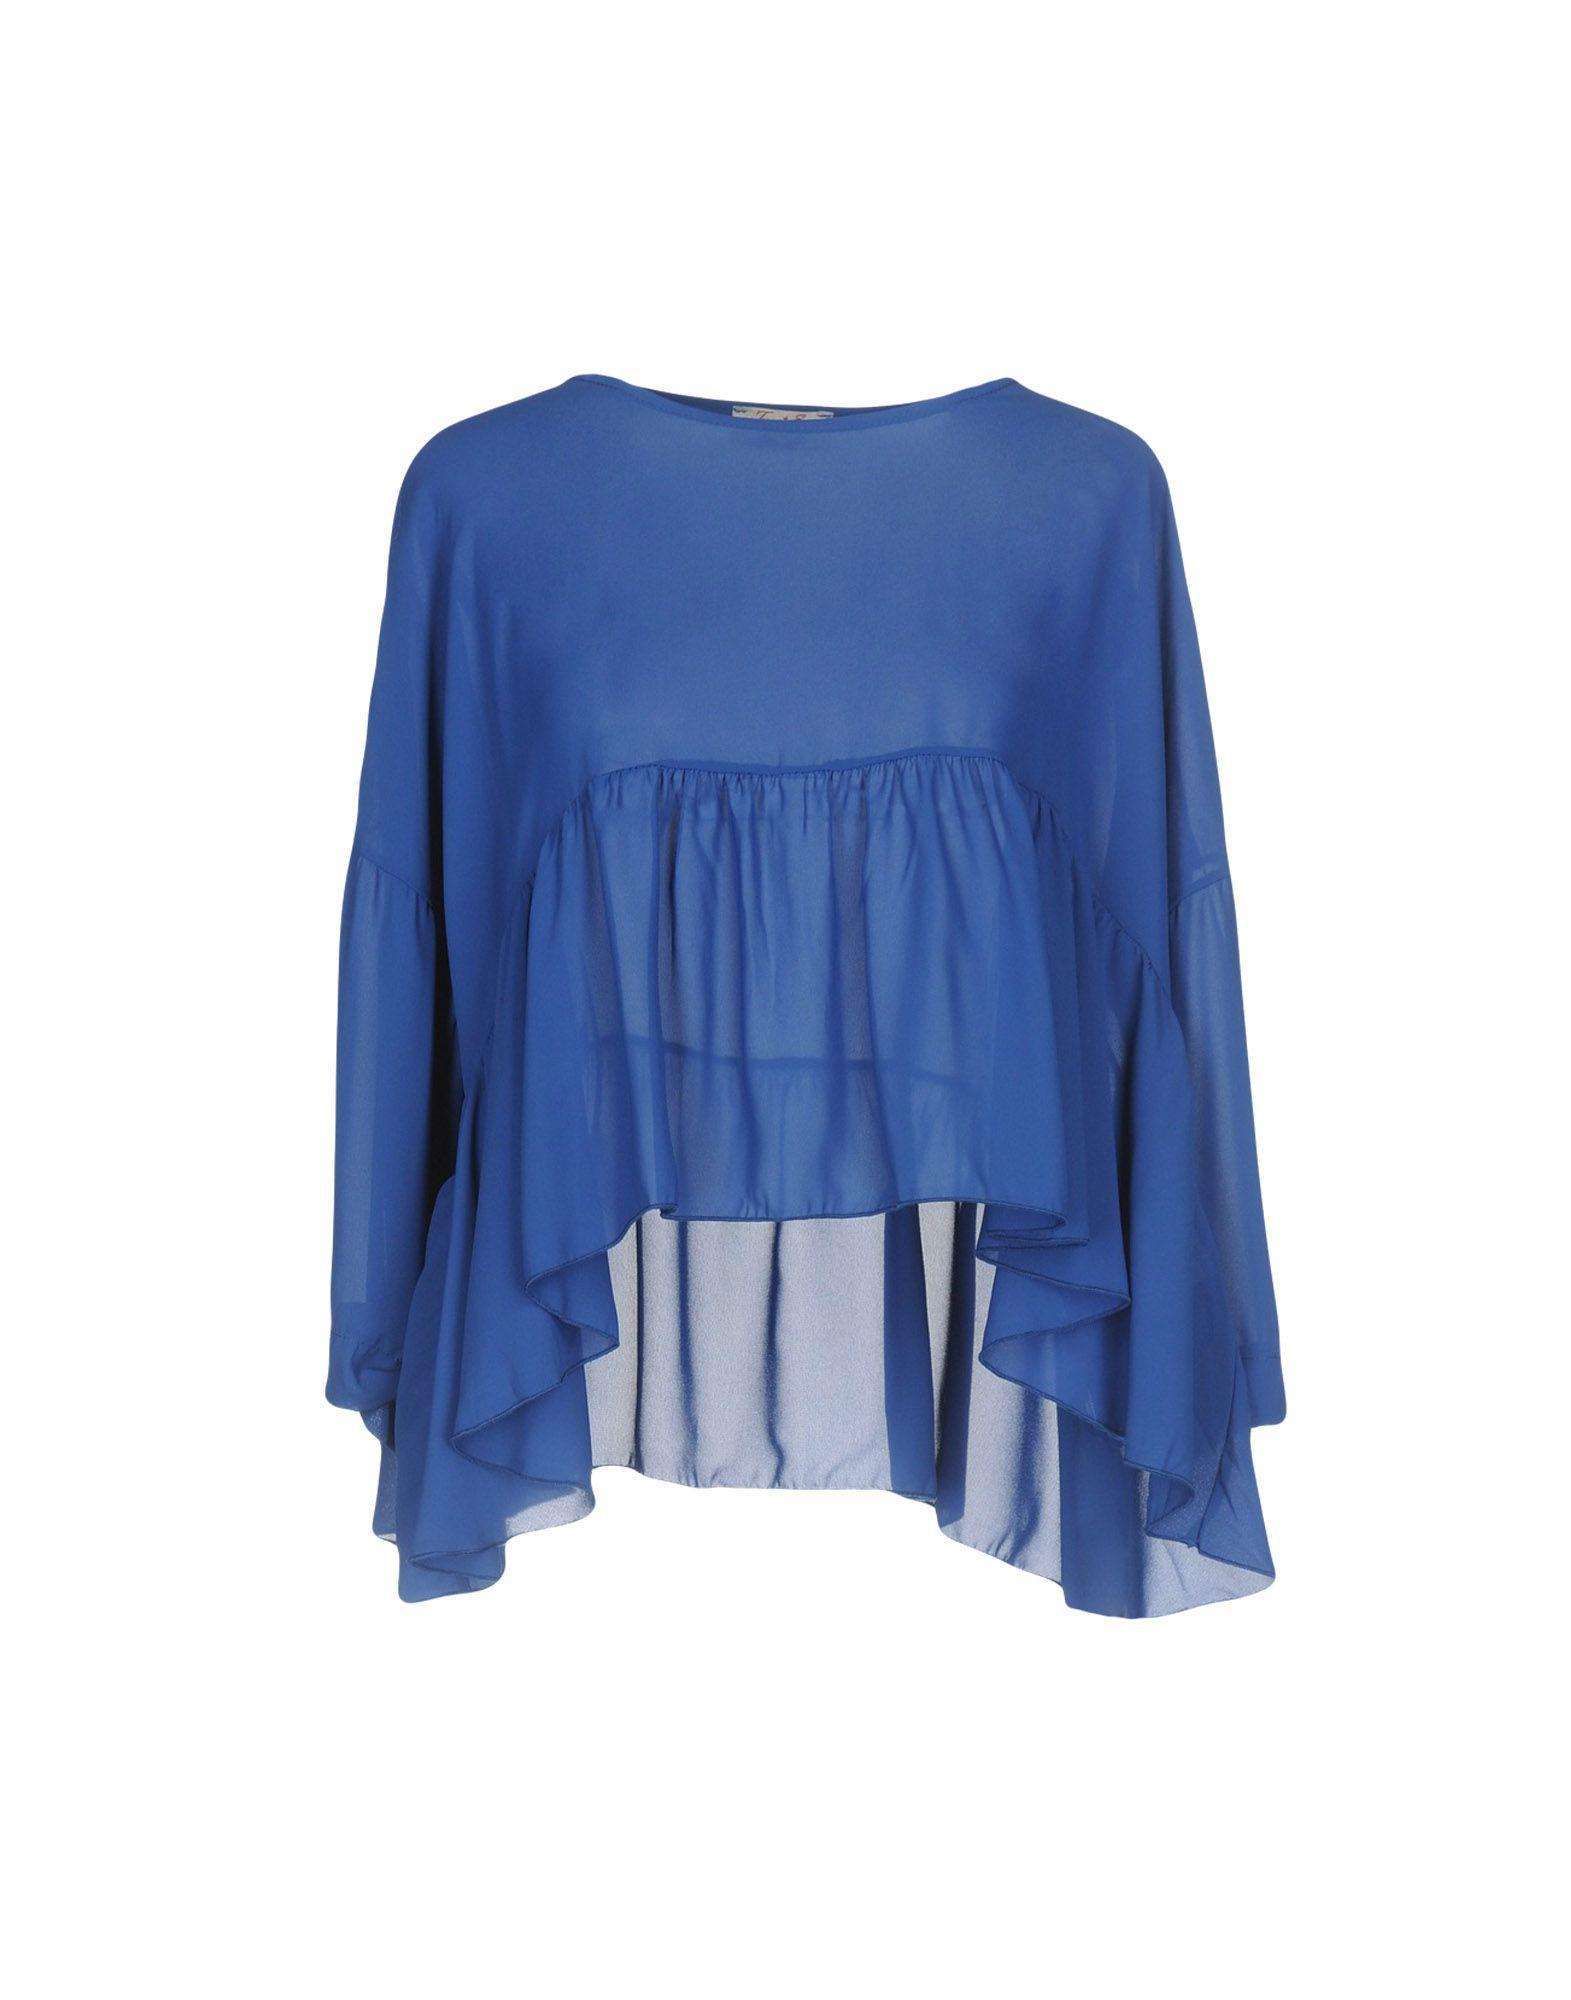 Lyst Twenty Easy By Kaos Blouse In Blue Dior Gallery